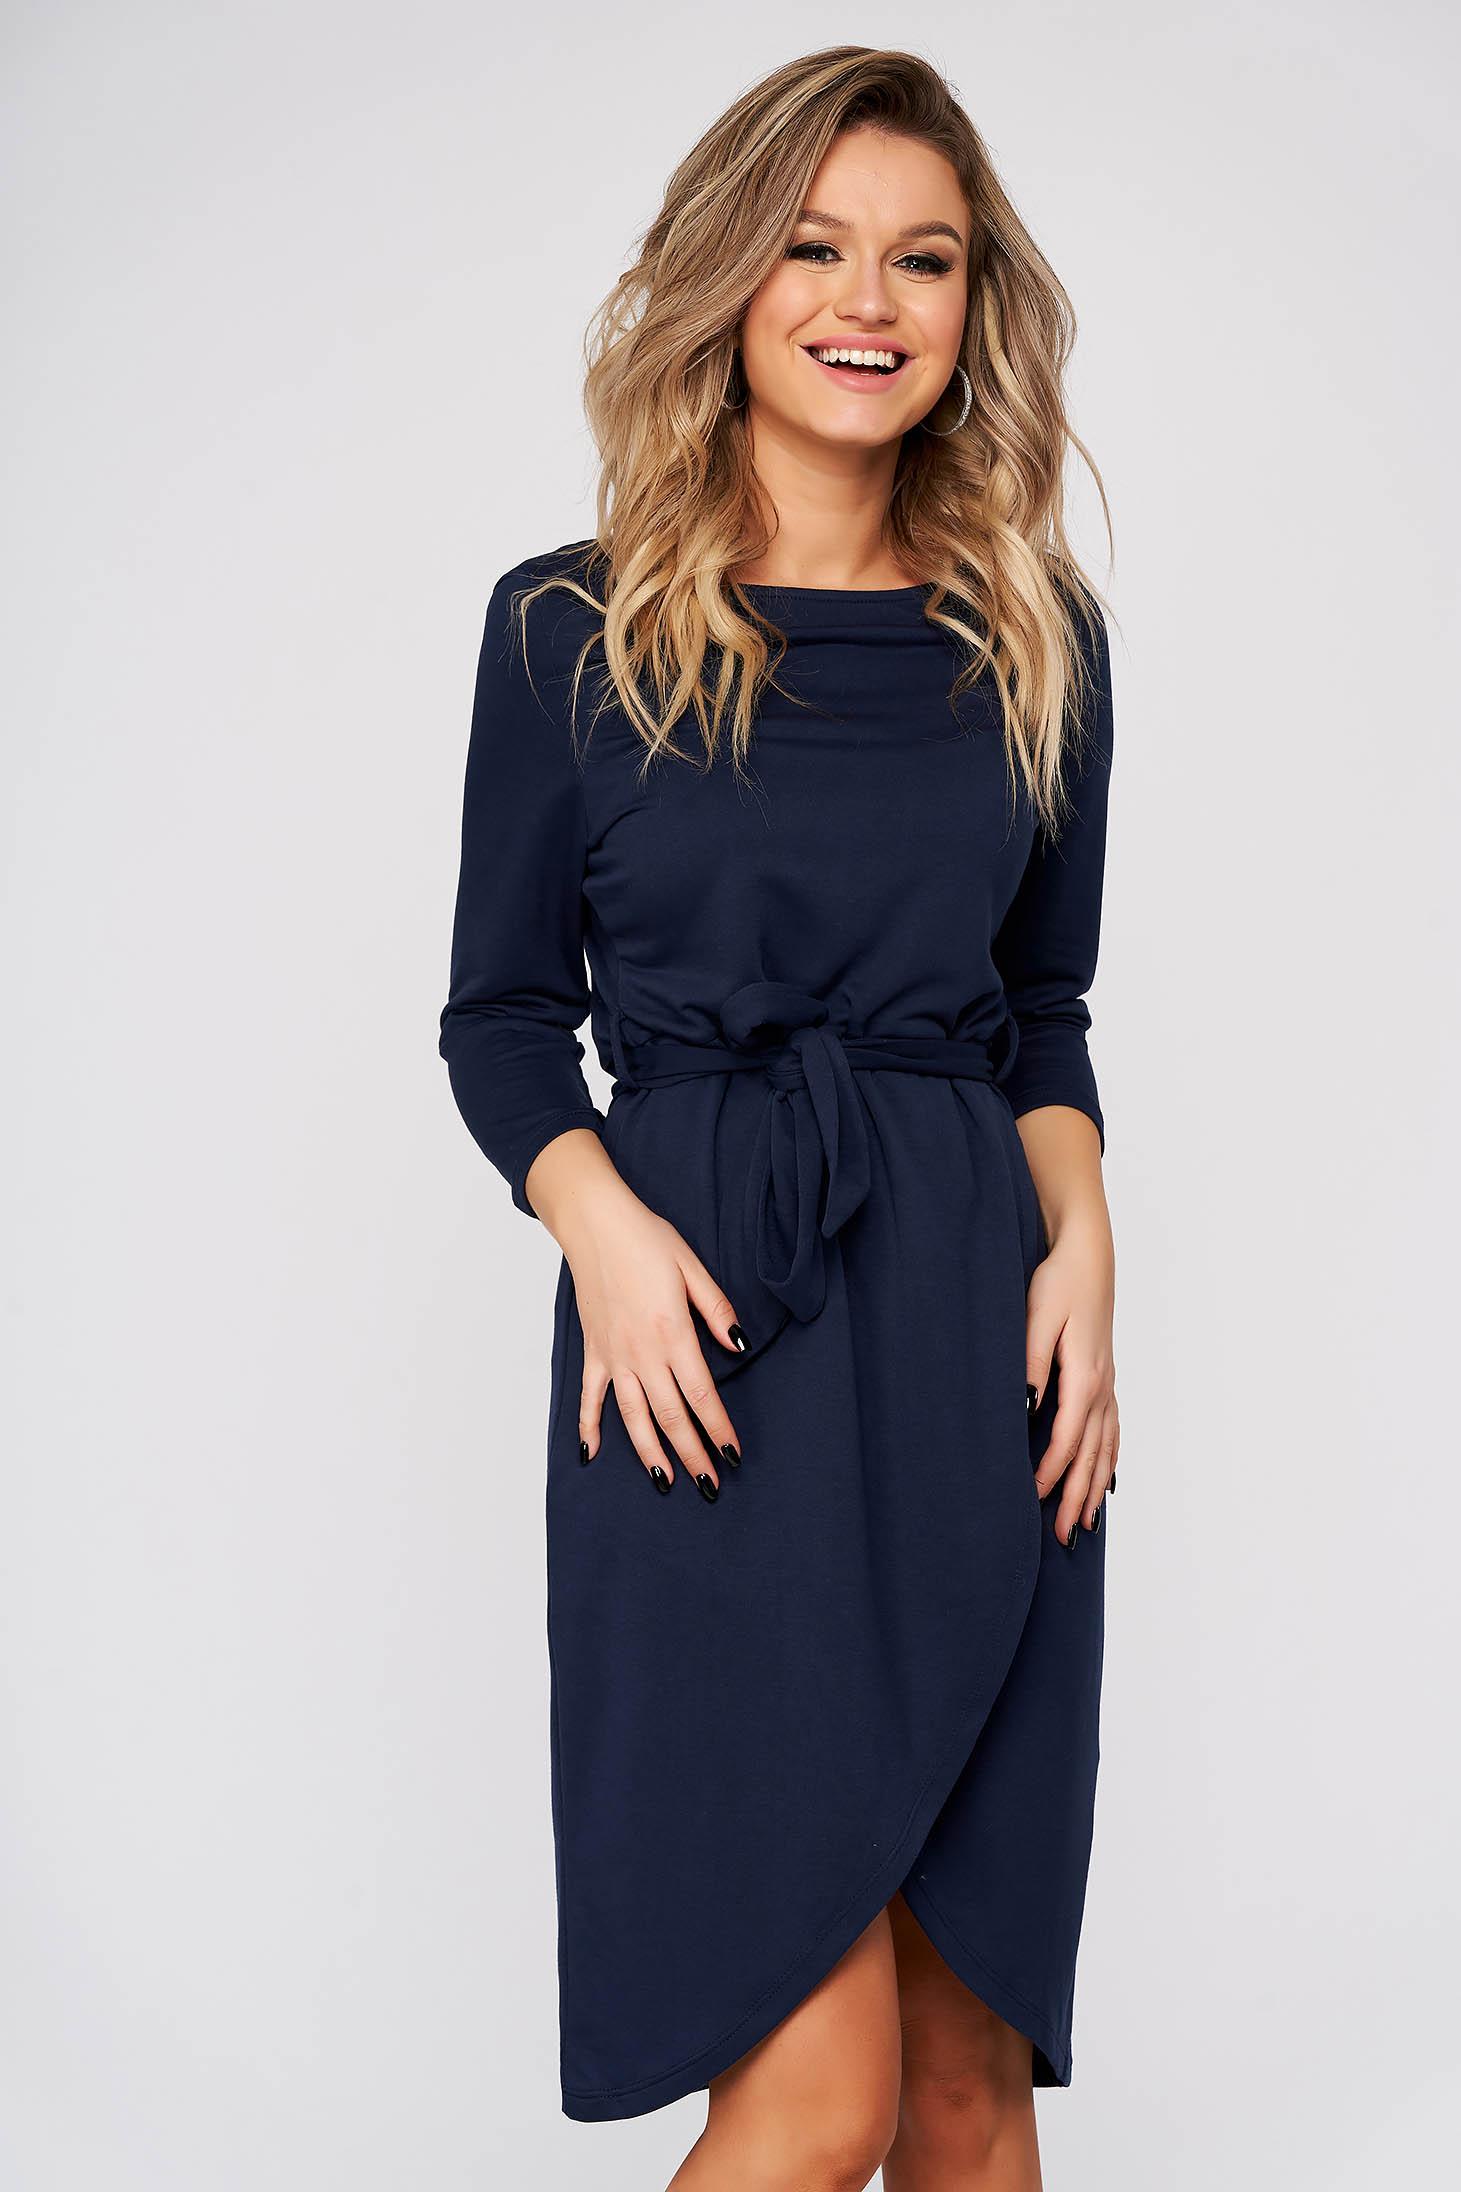 Darkblue dress daily asymmetrical with elastic waist long sleeved